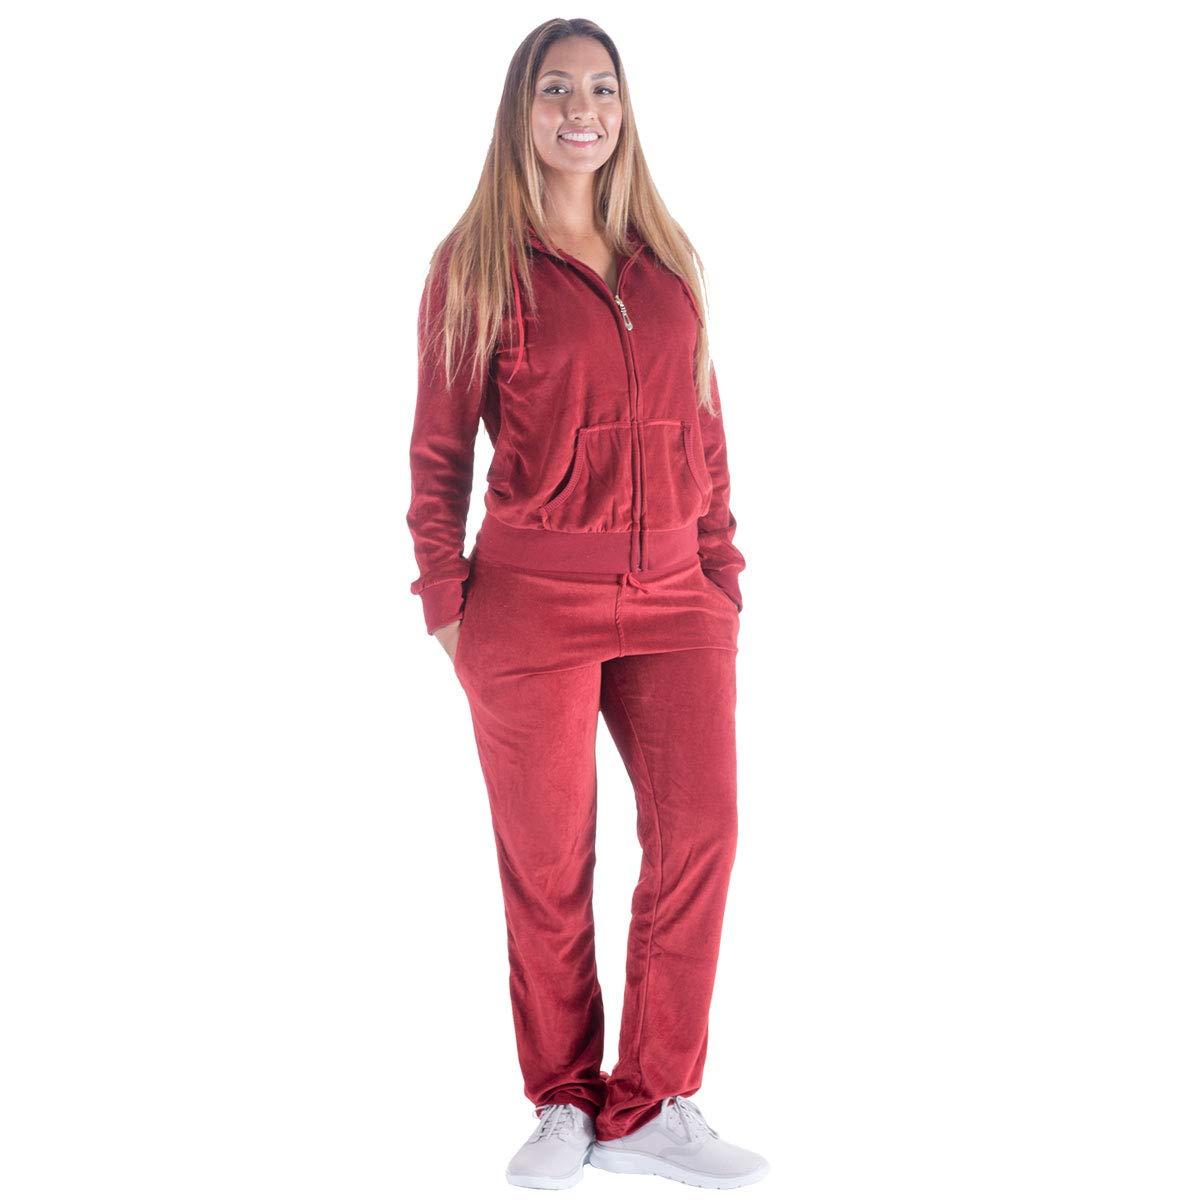 Black Grey Womens Velvet Zip Hooded Sweatshirt Athletic Soft Plus Size Hooded and Sweat Pants Tracksuit Set (L, Wine)